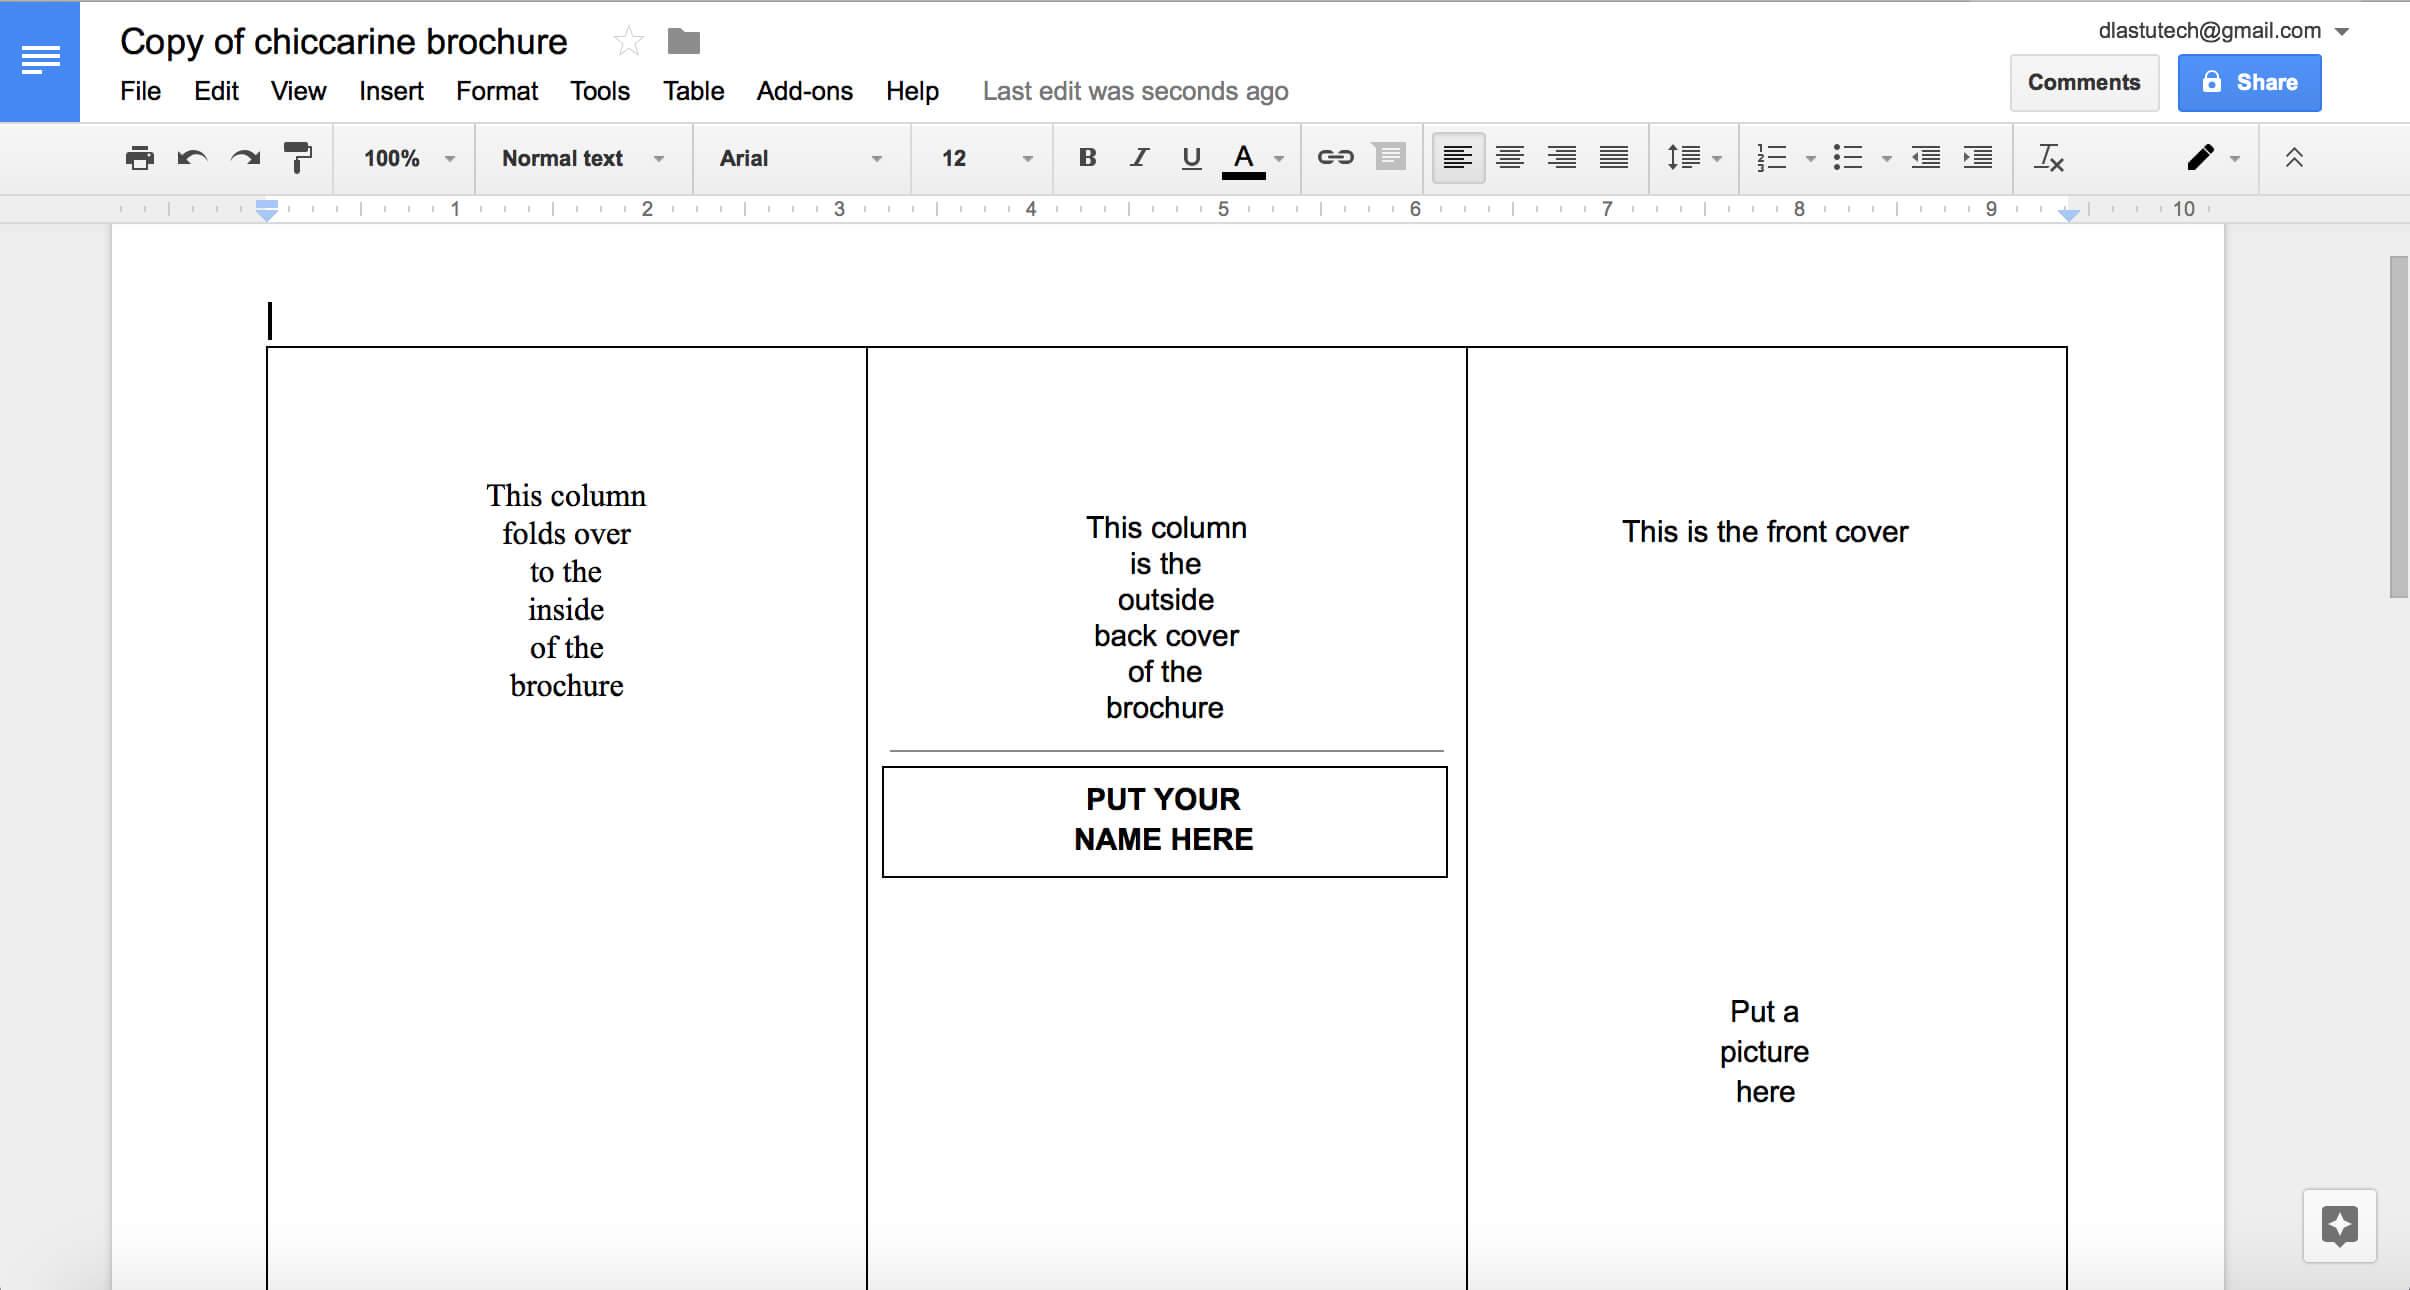 019 Blank Tri Fold Brochure Template Google Slides Ideas Regarding Brochure Template For Google Docs